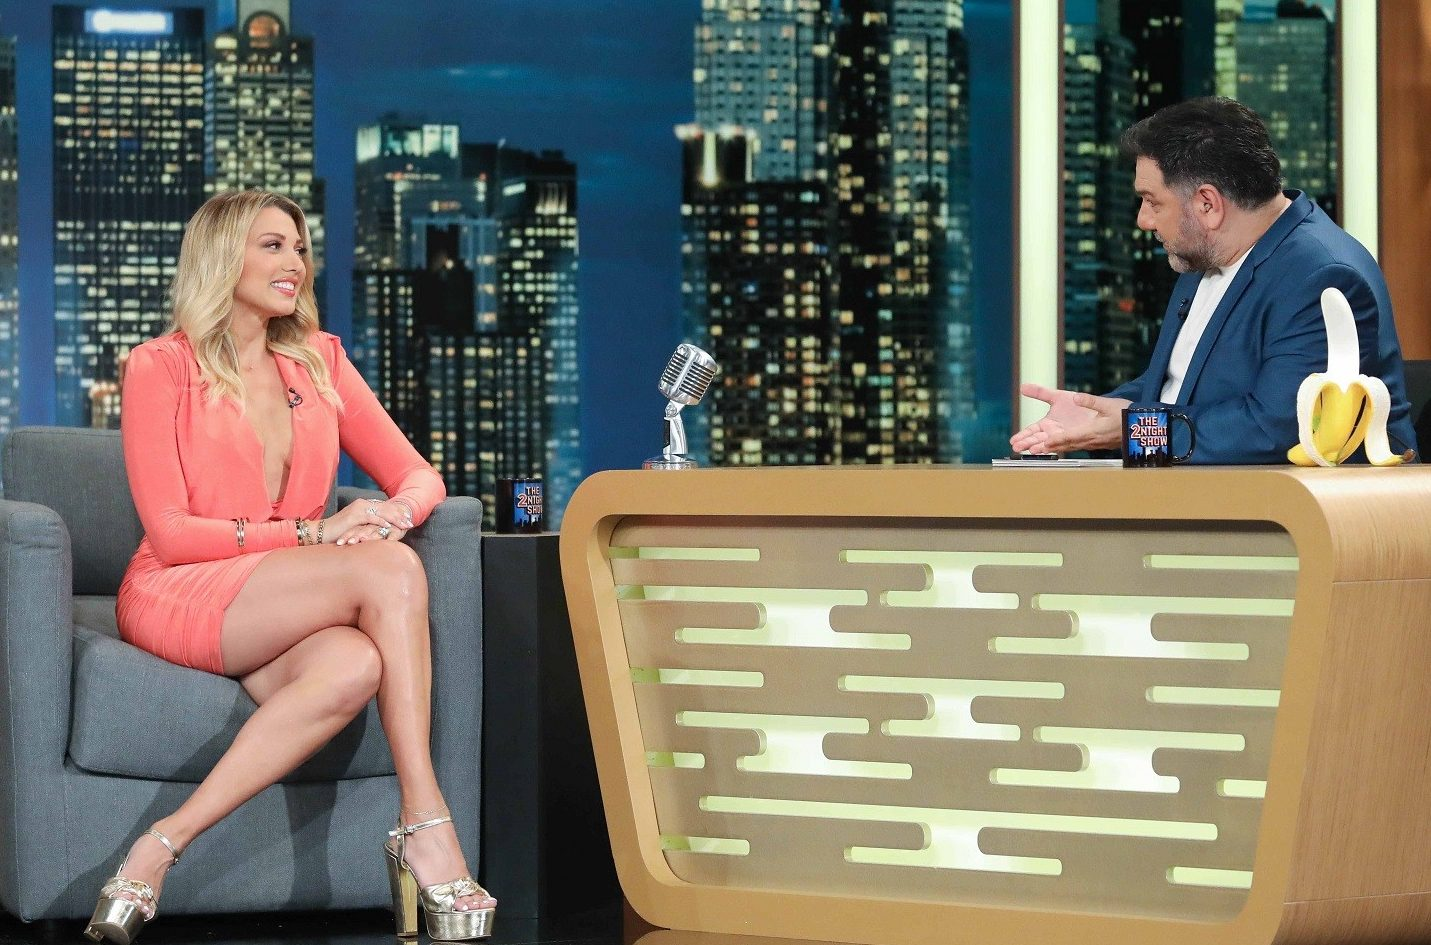 The 2Night Show: οι καλεσμένοι του Γρηγόρη Αρναούτογλου μιλούν για όλα (βίντεο)